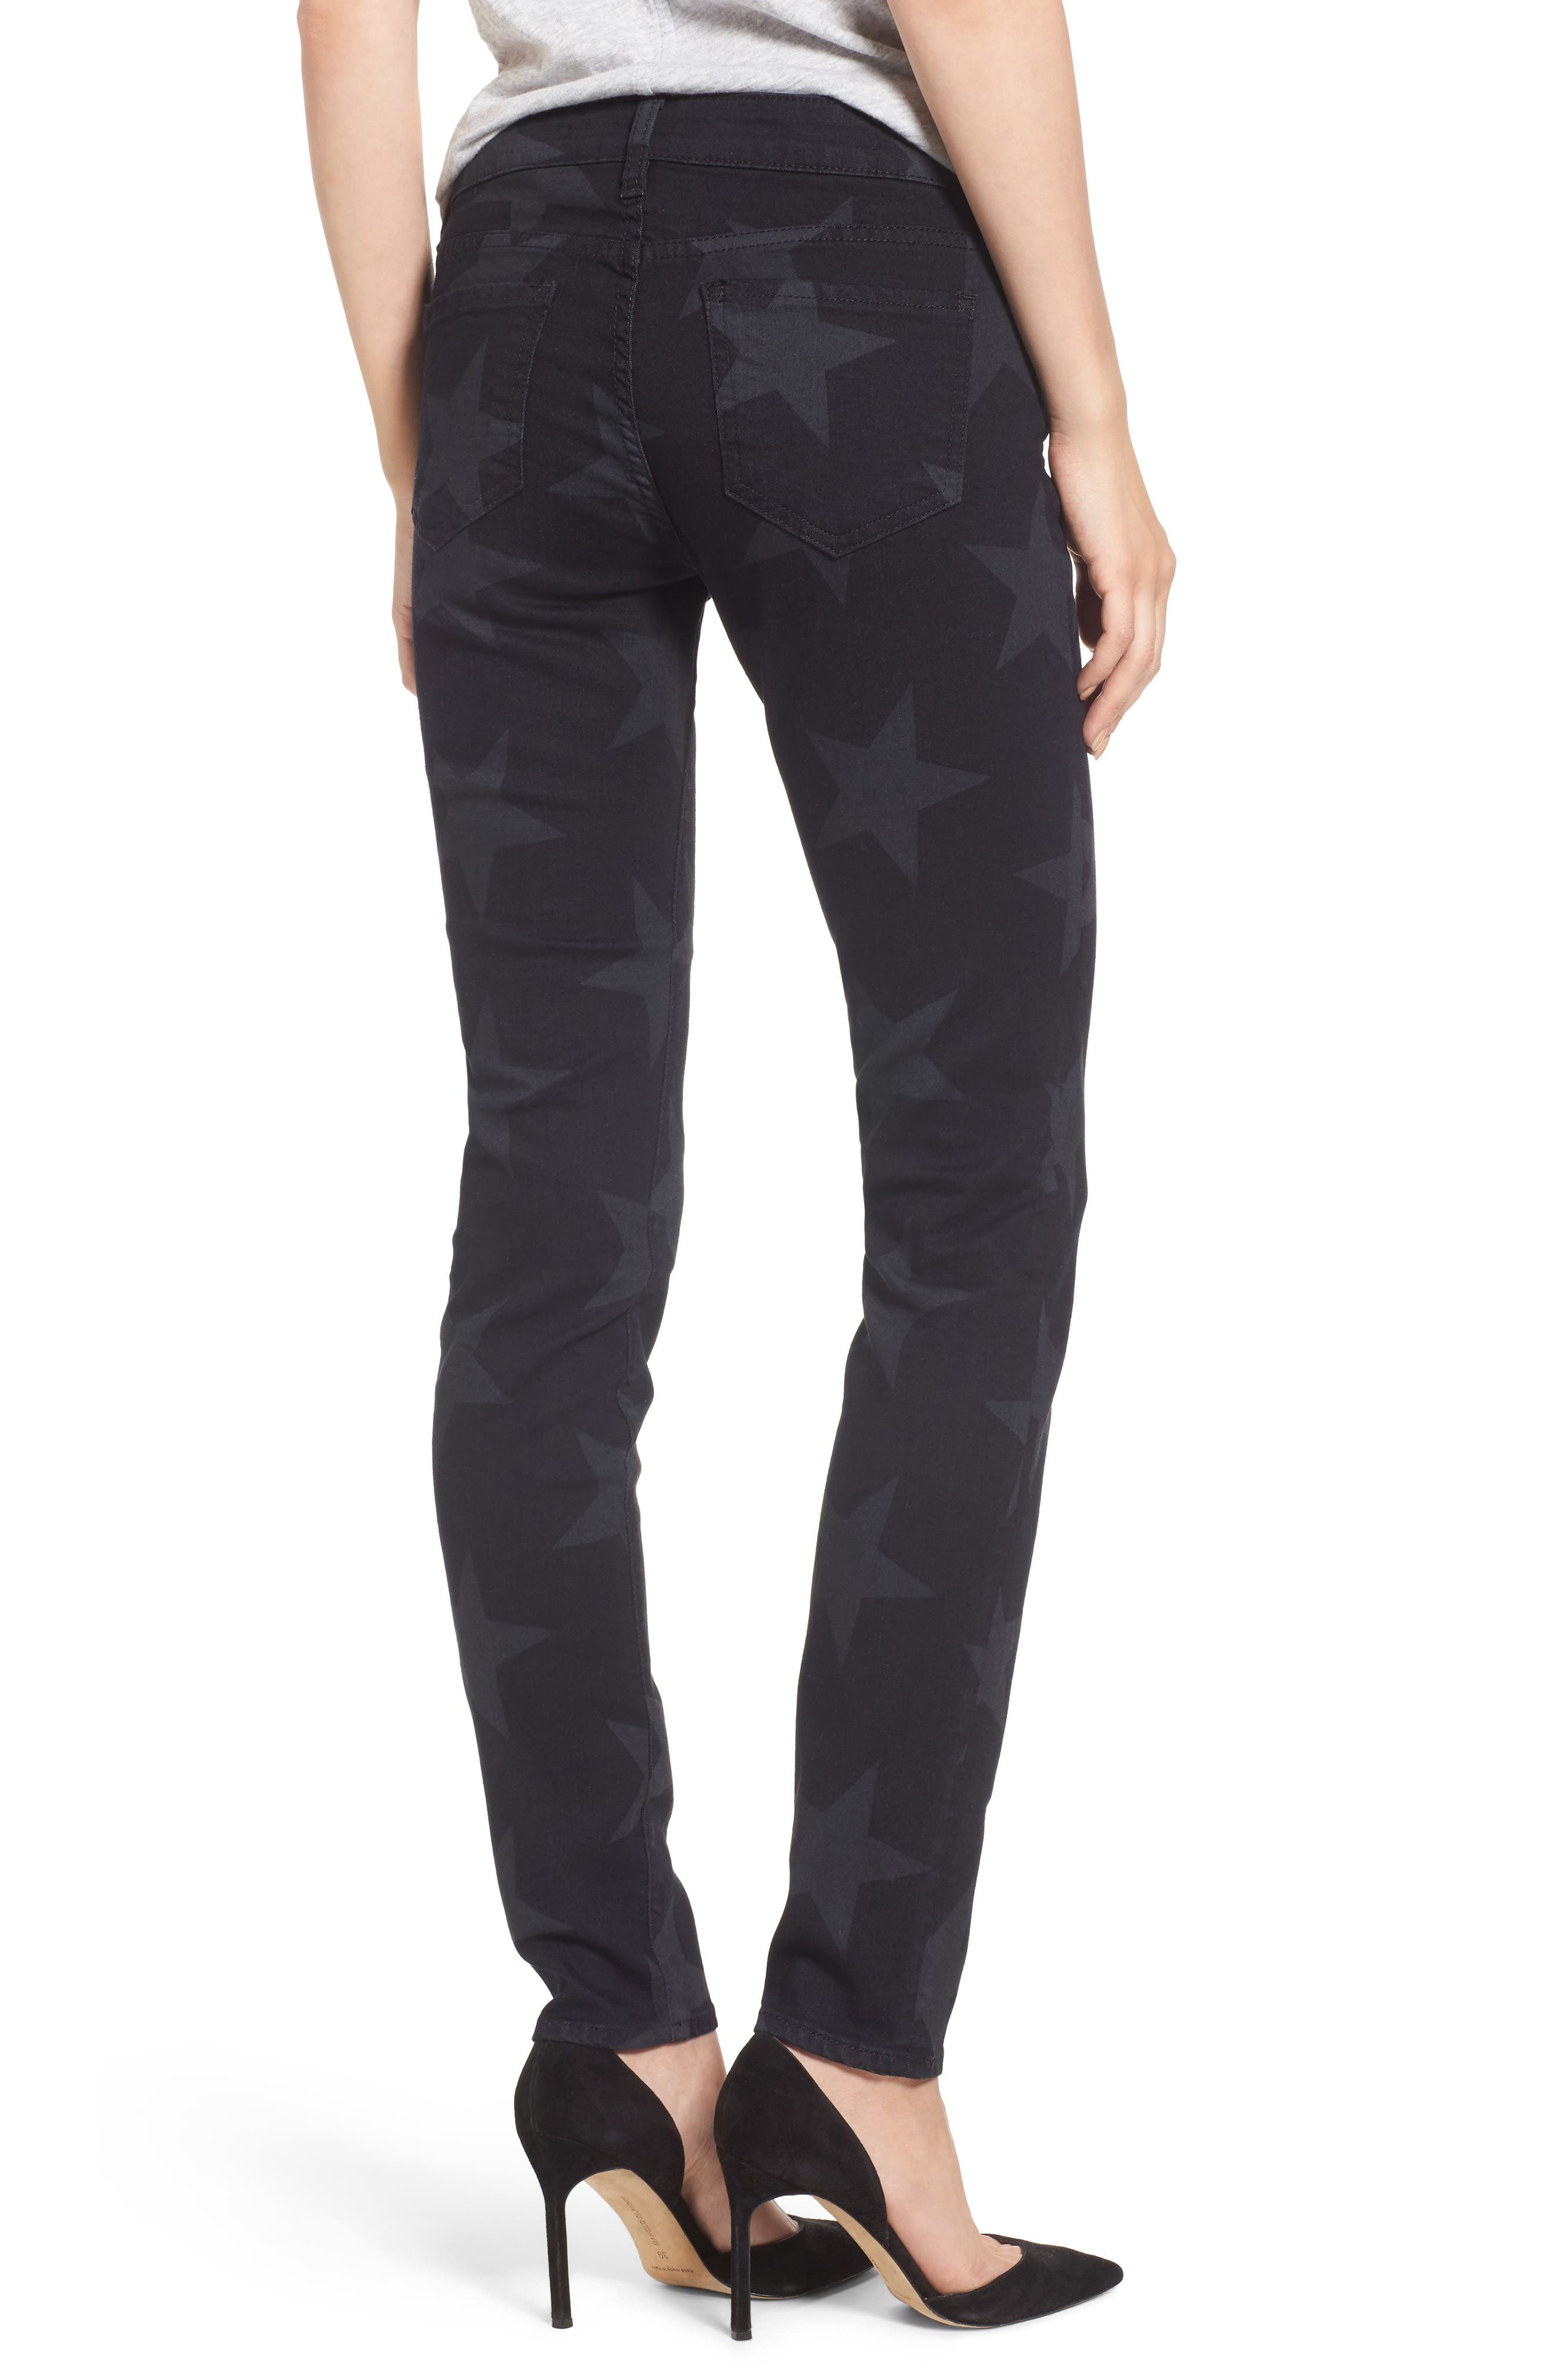 Mia Star Print Skinny Jeans,                             Alternate thumbnail 3, color,                             Trailblazing